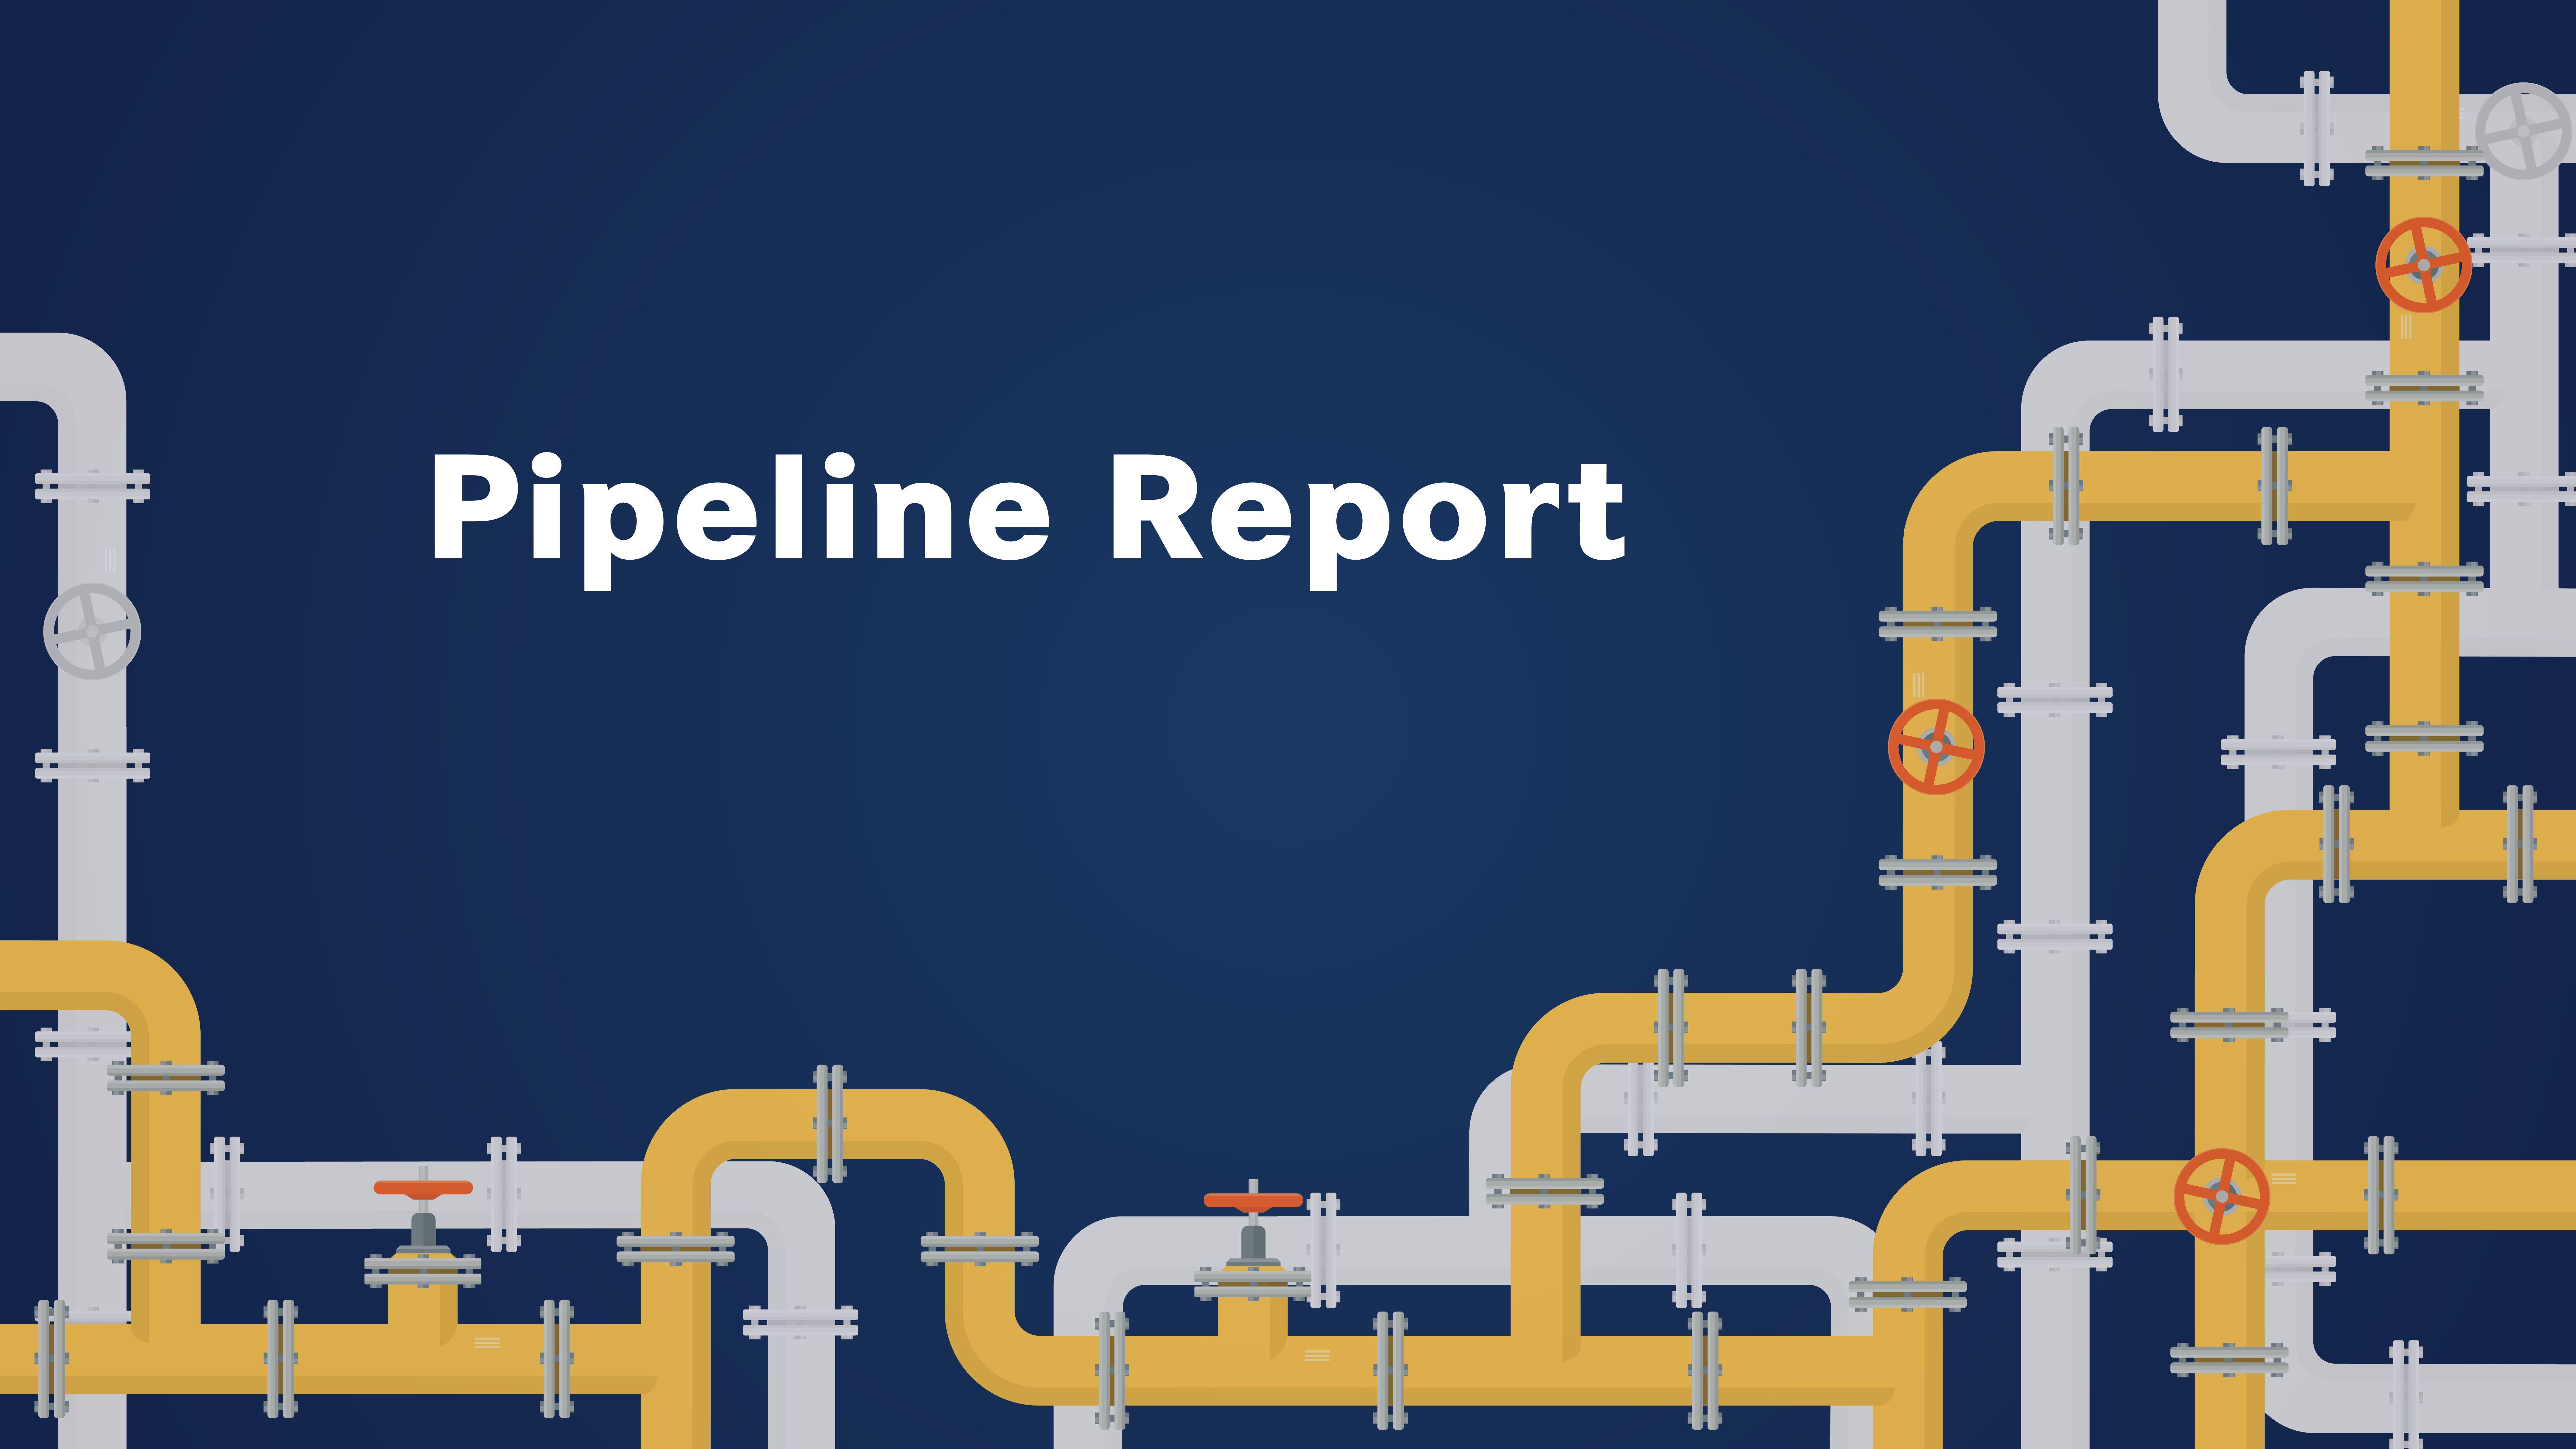 Pipeline Report | <b>Pipeline Report: November 2020</b>